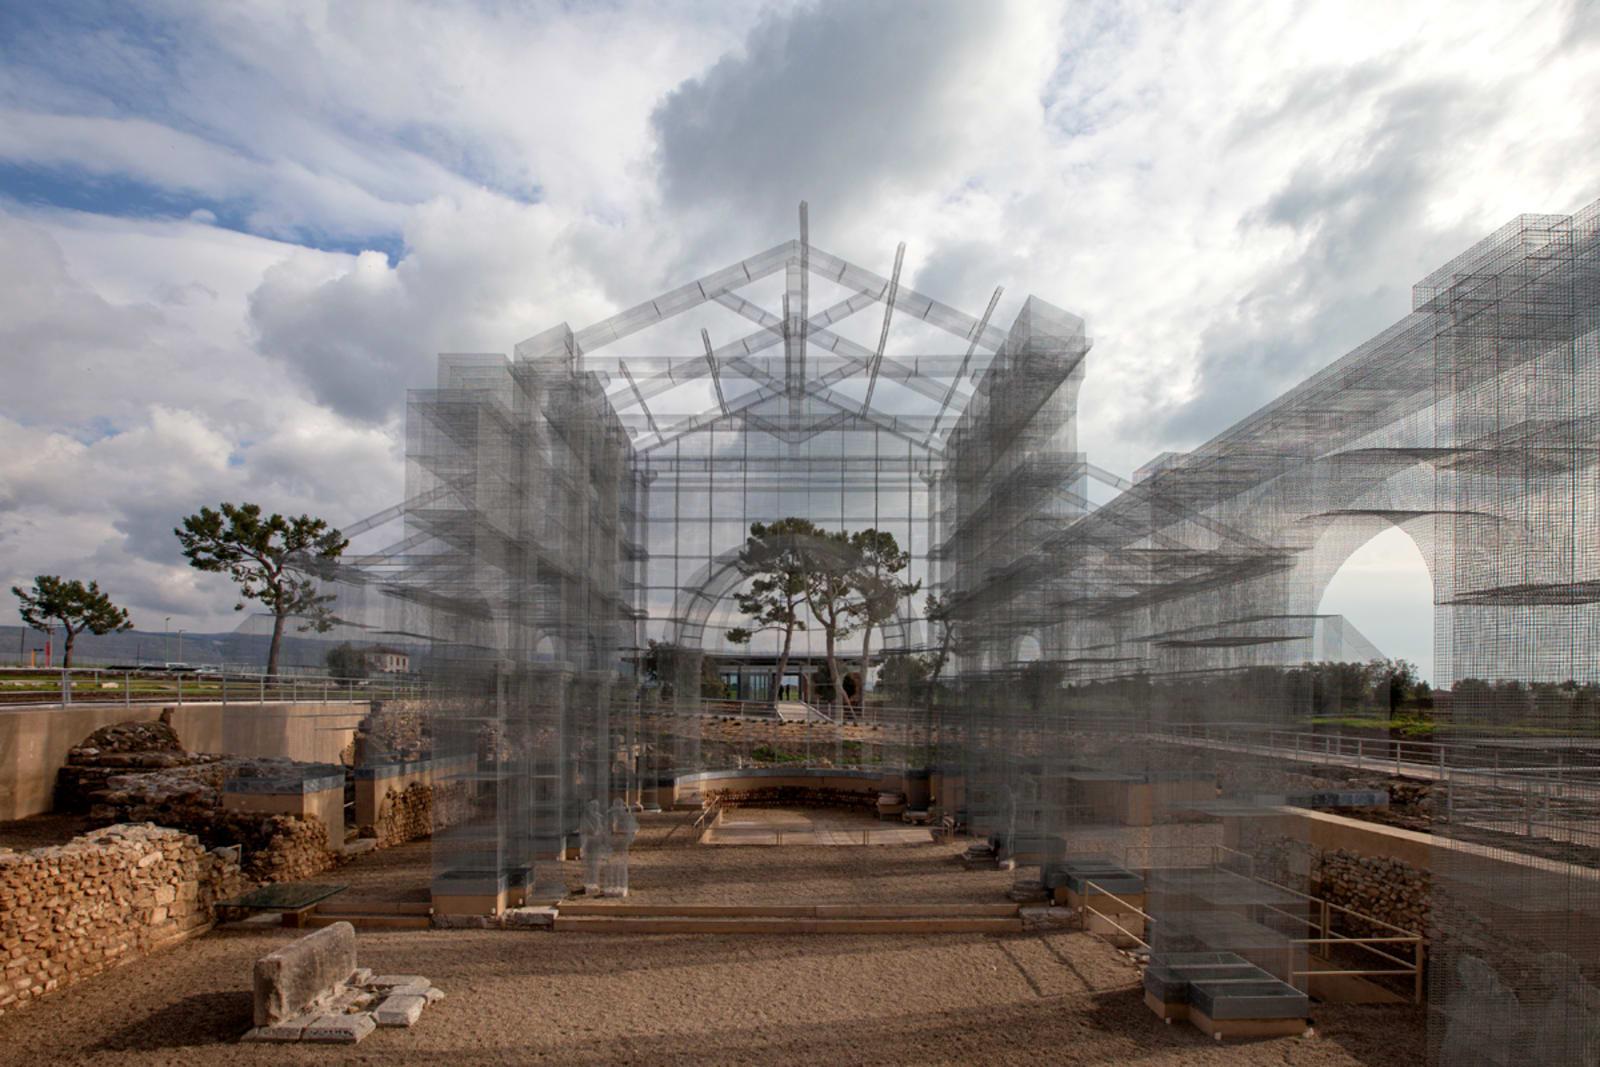 architettura trasparente